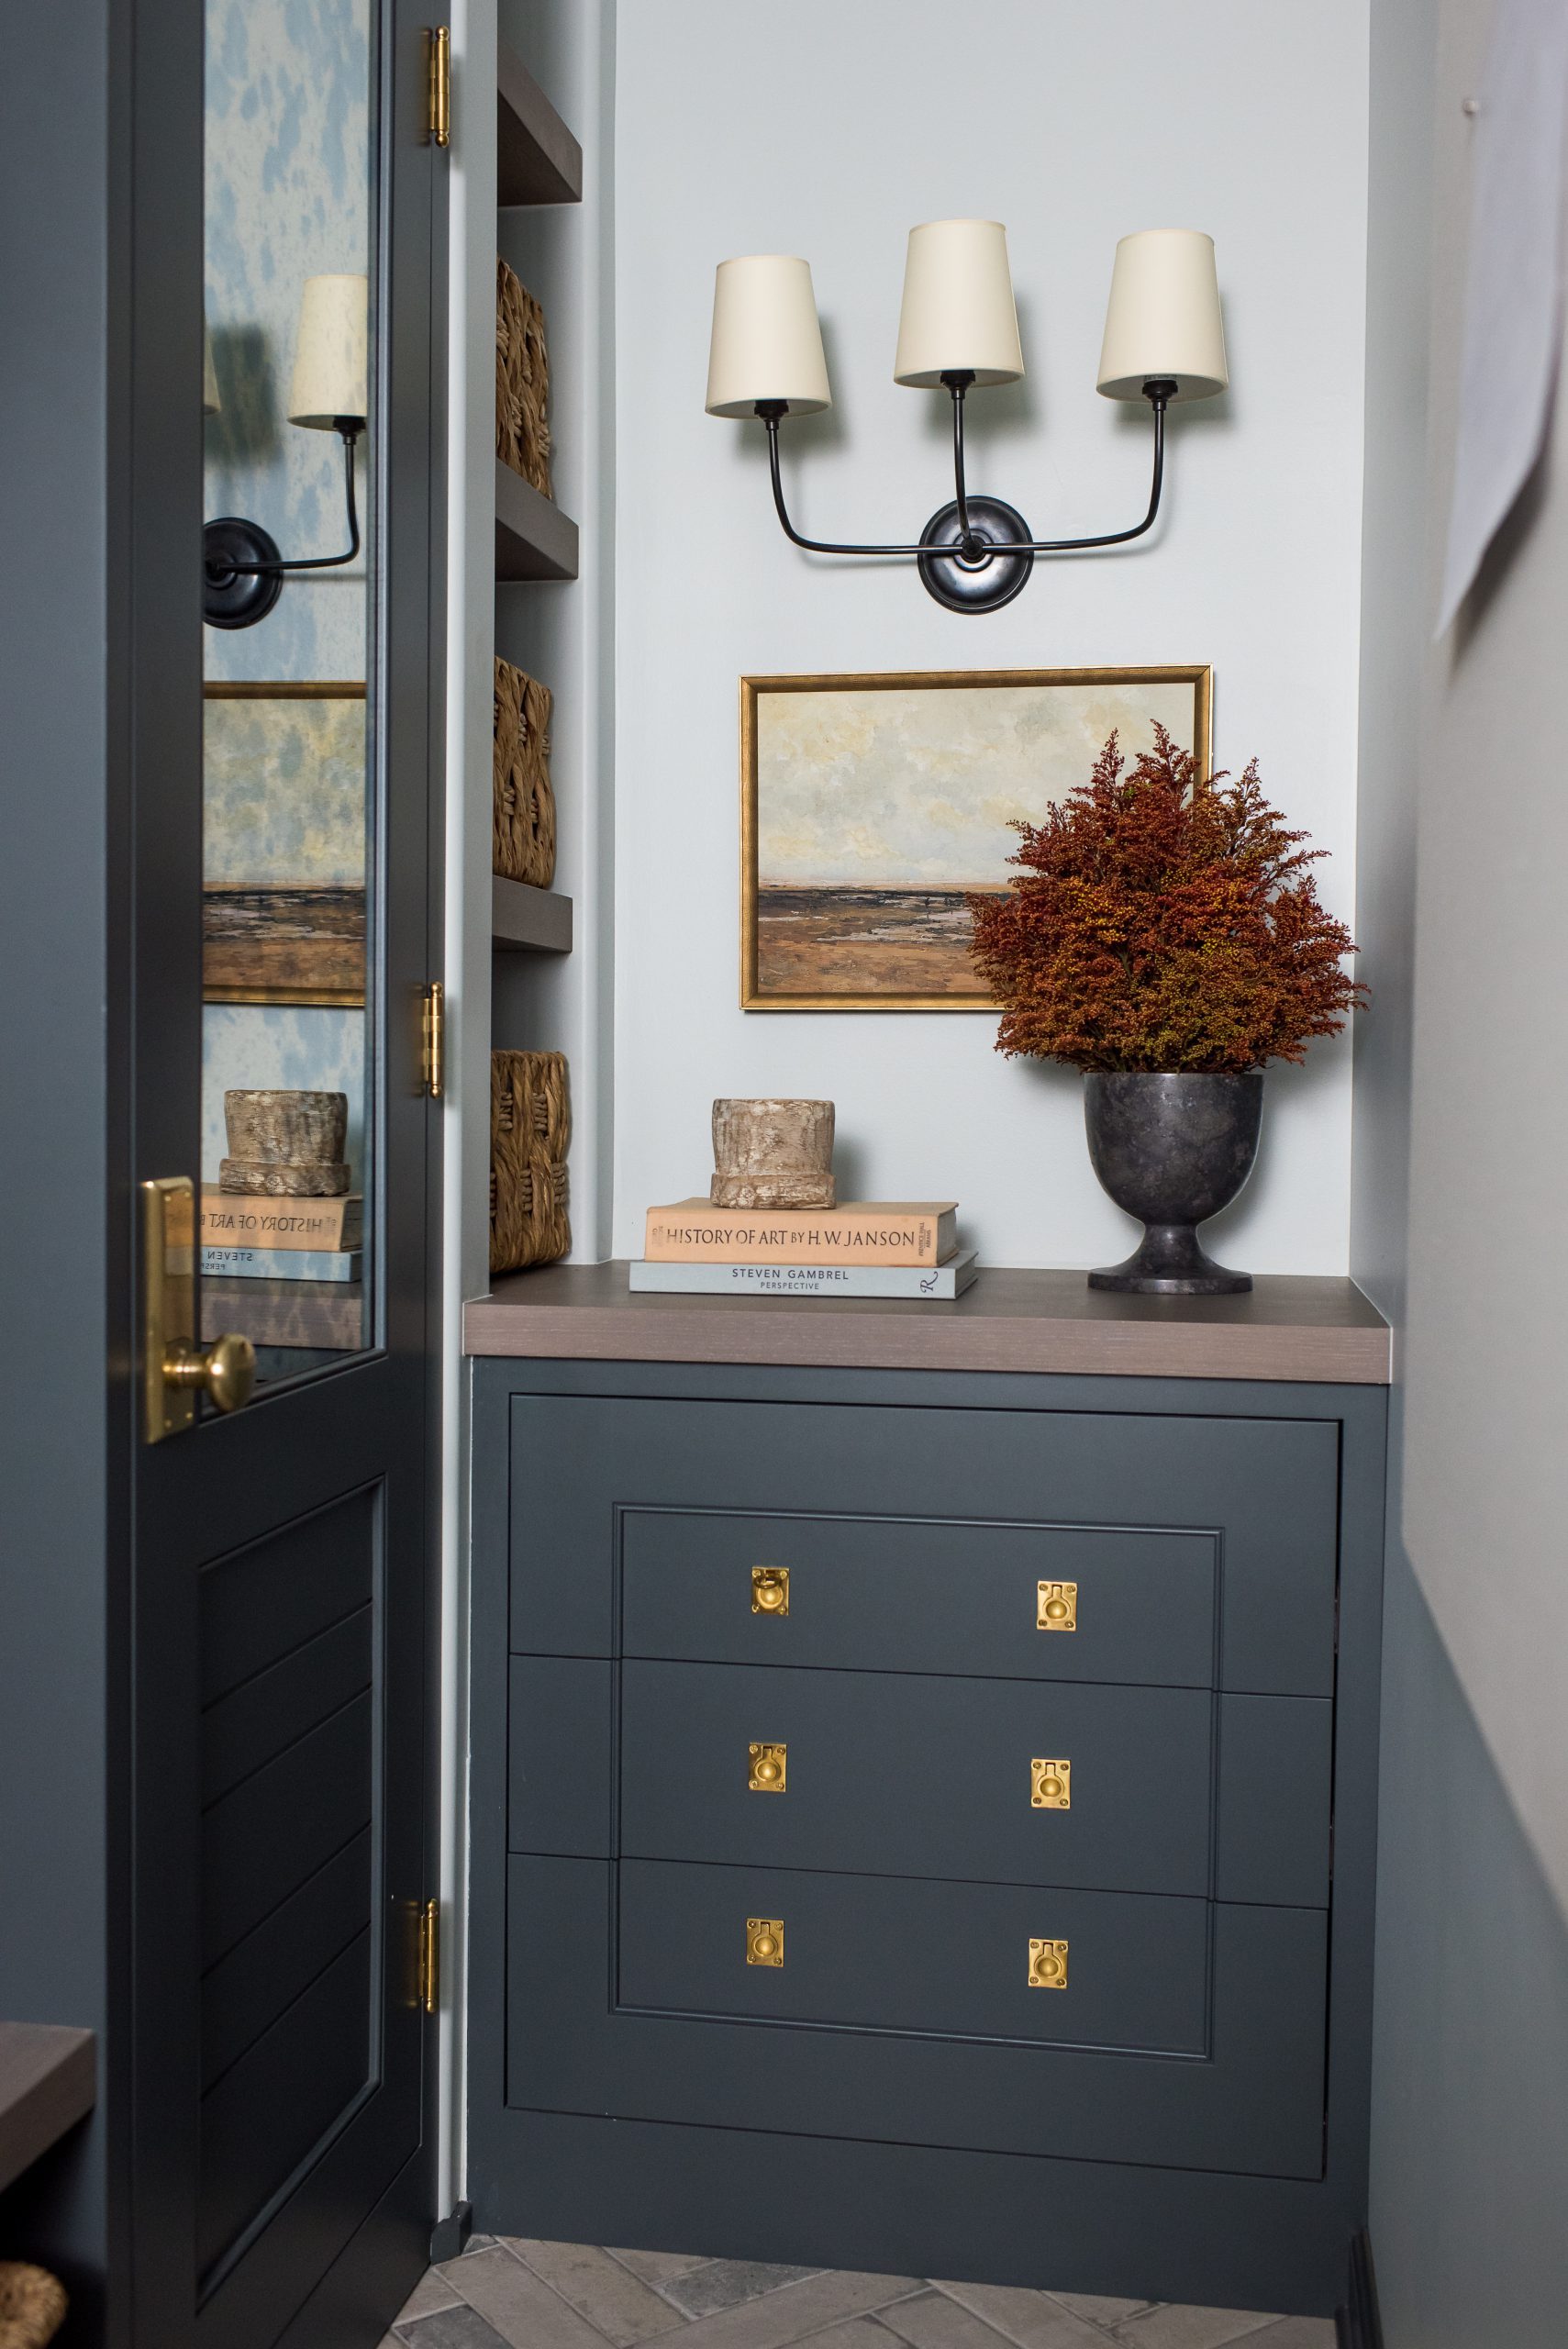 Mixing Metals with Interior Designer Whittney Parkinson